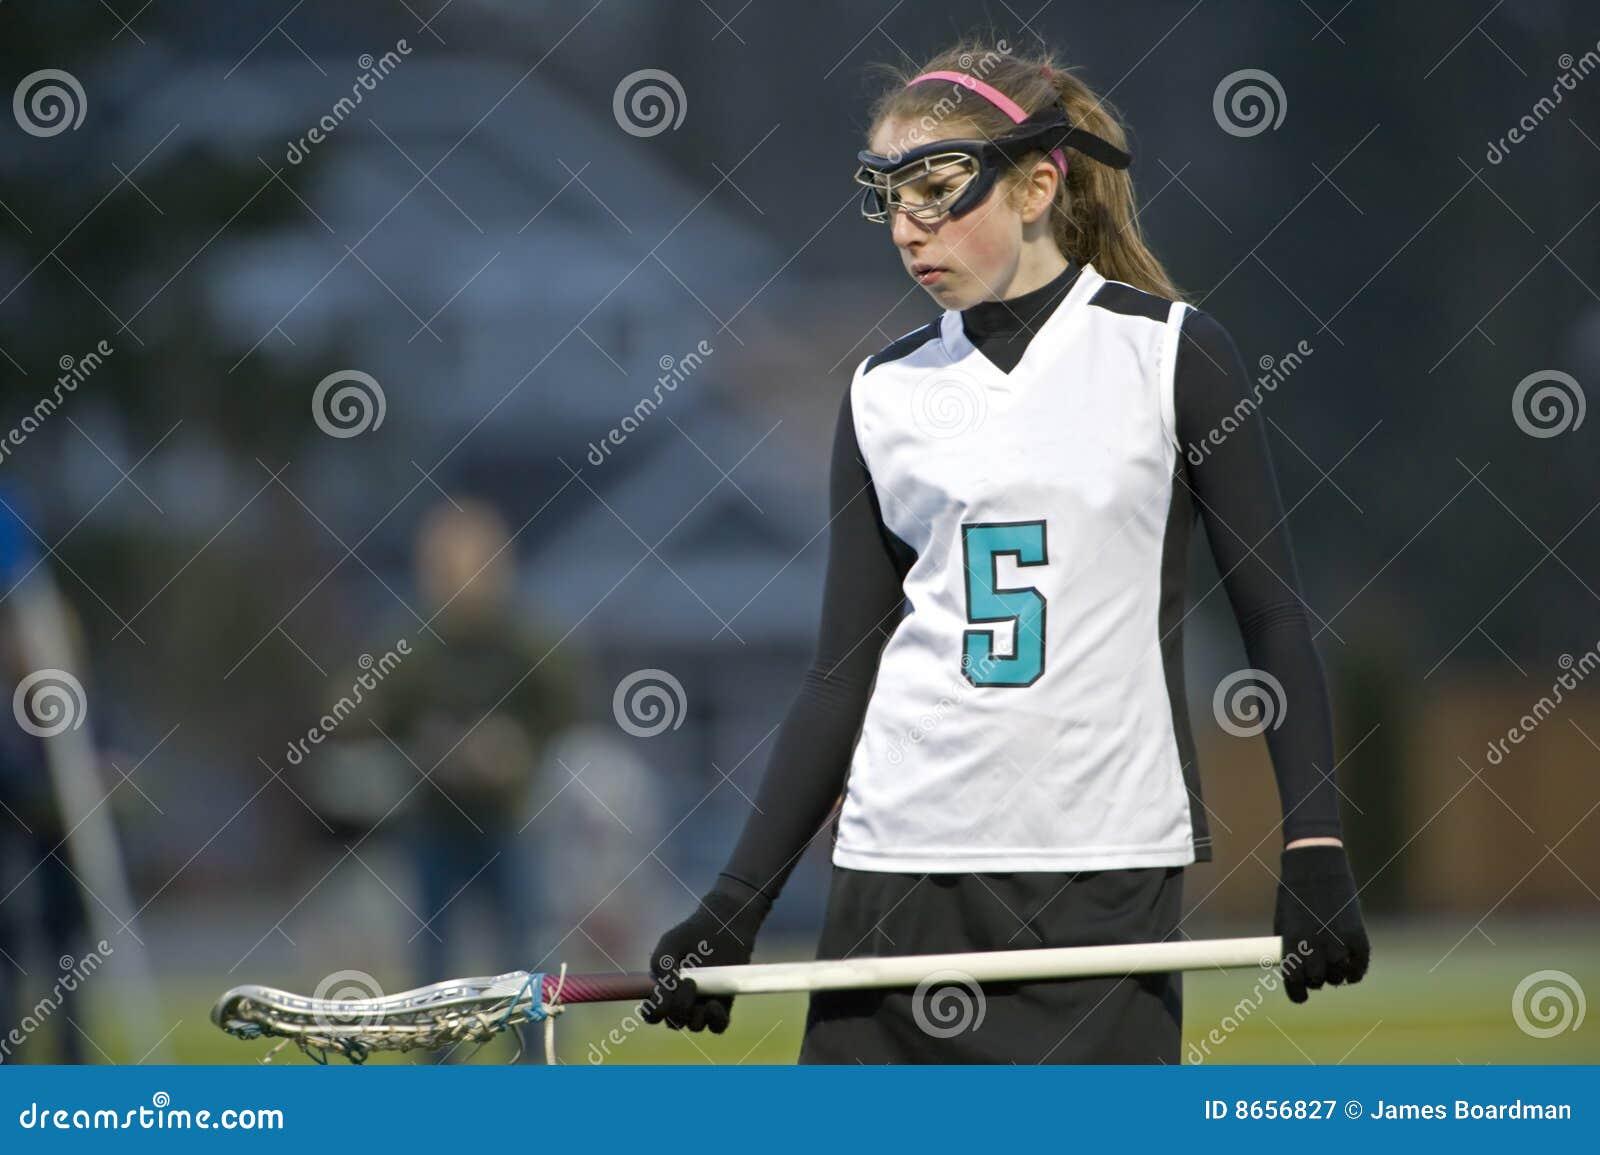 High School Girls Lacrosse Night Game Stock Image - Image ...